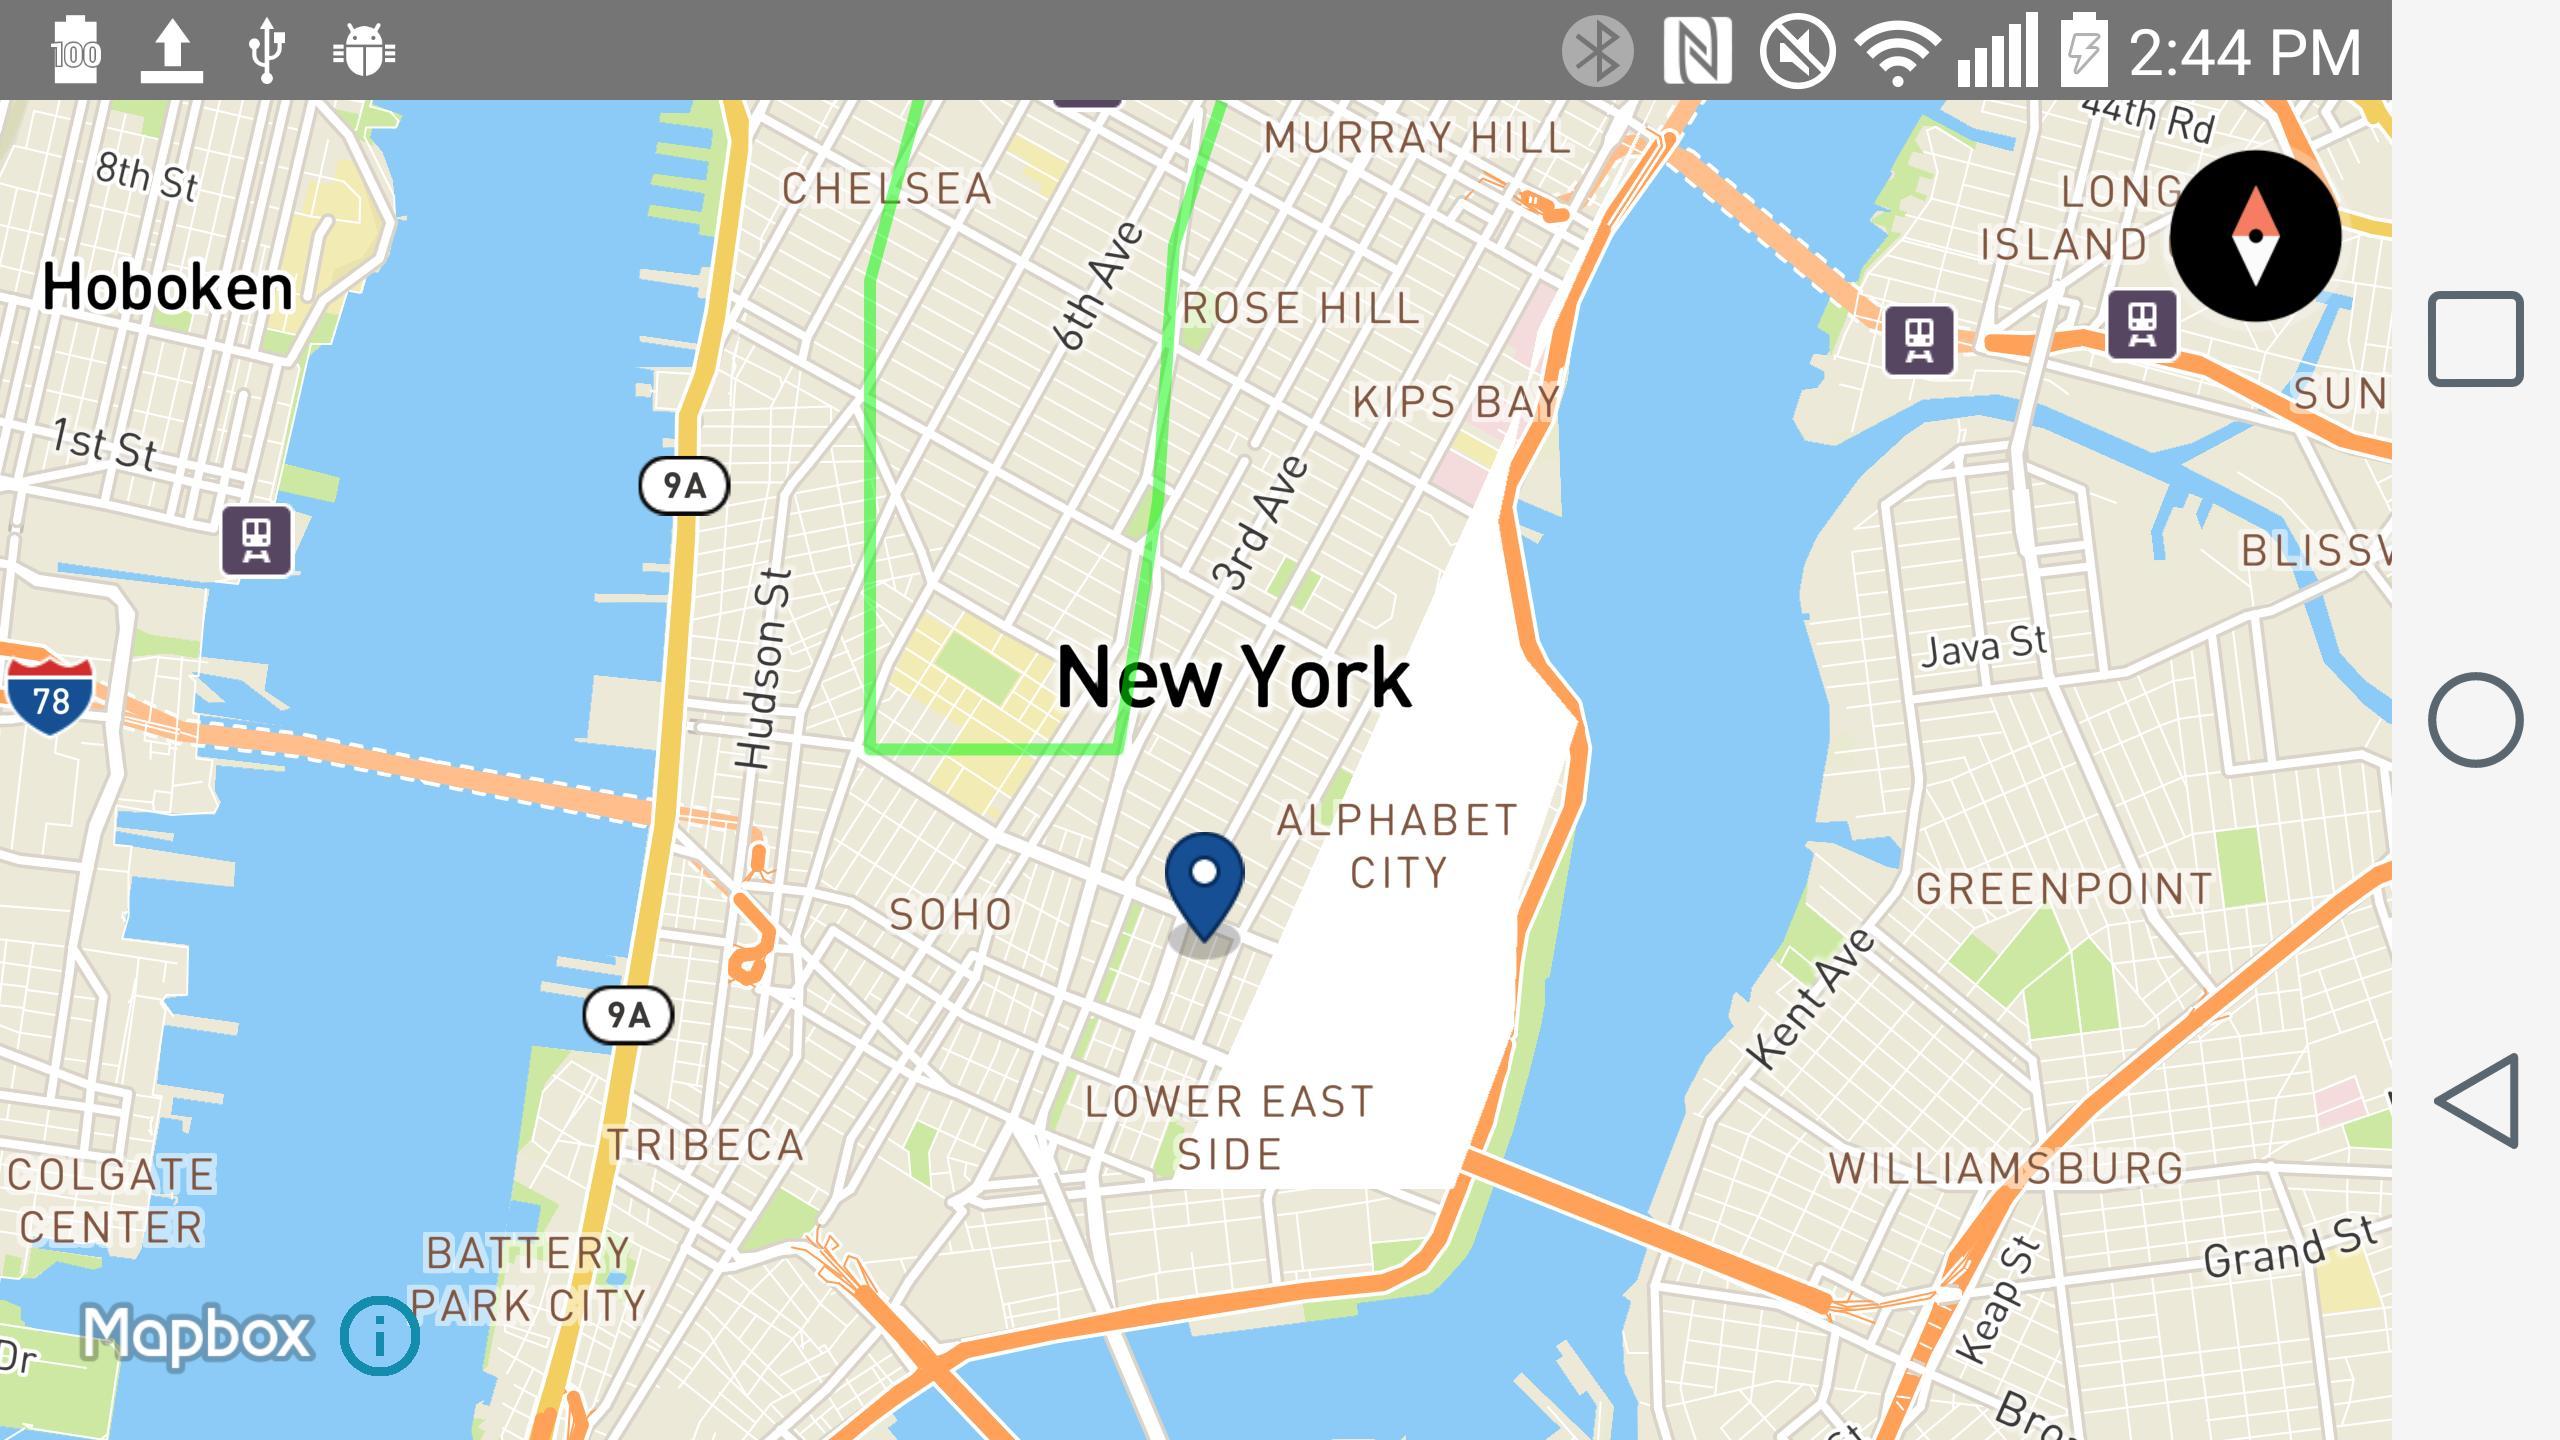 GitHub - yoavrofe/react-native-mapbox-gl-1: A Mapbox GL